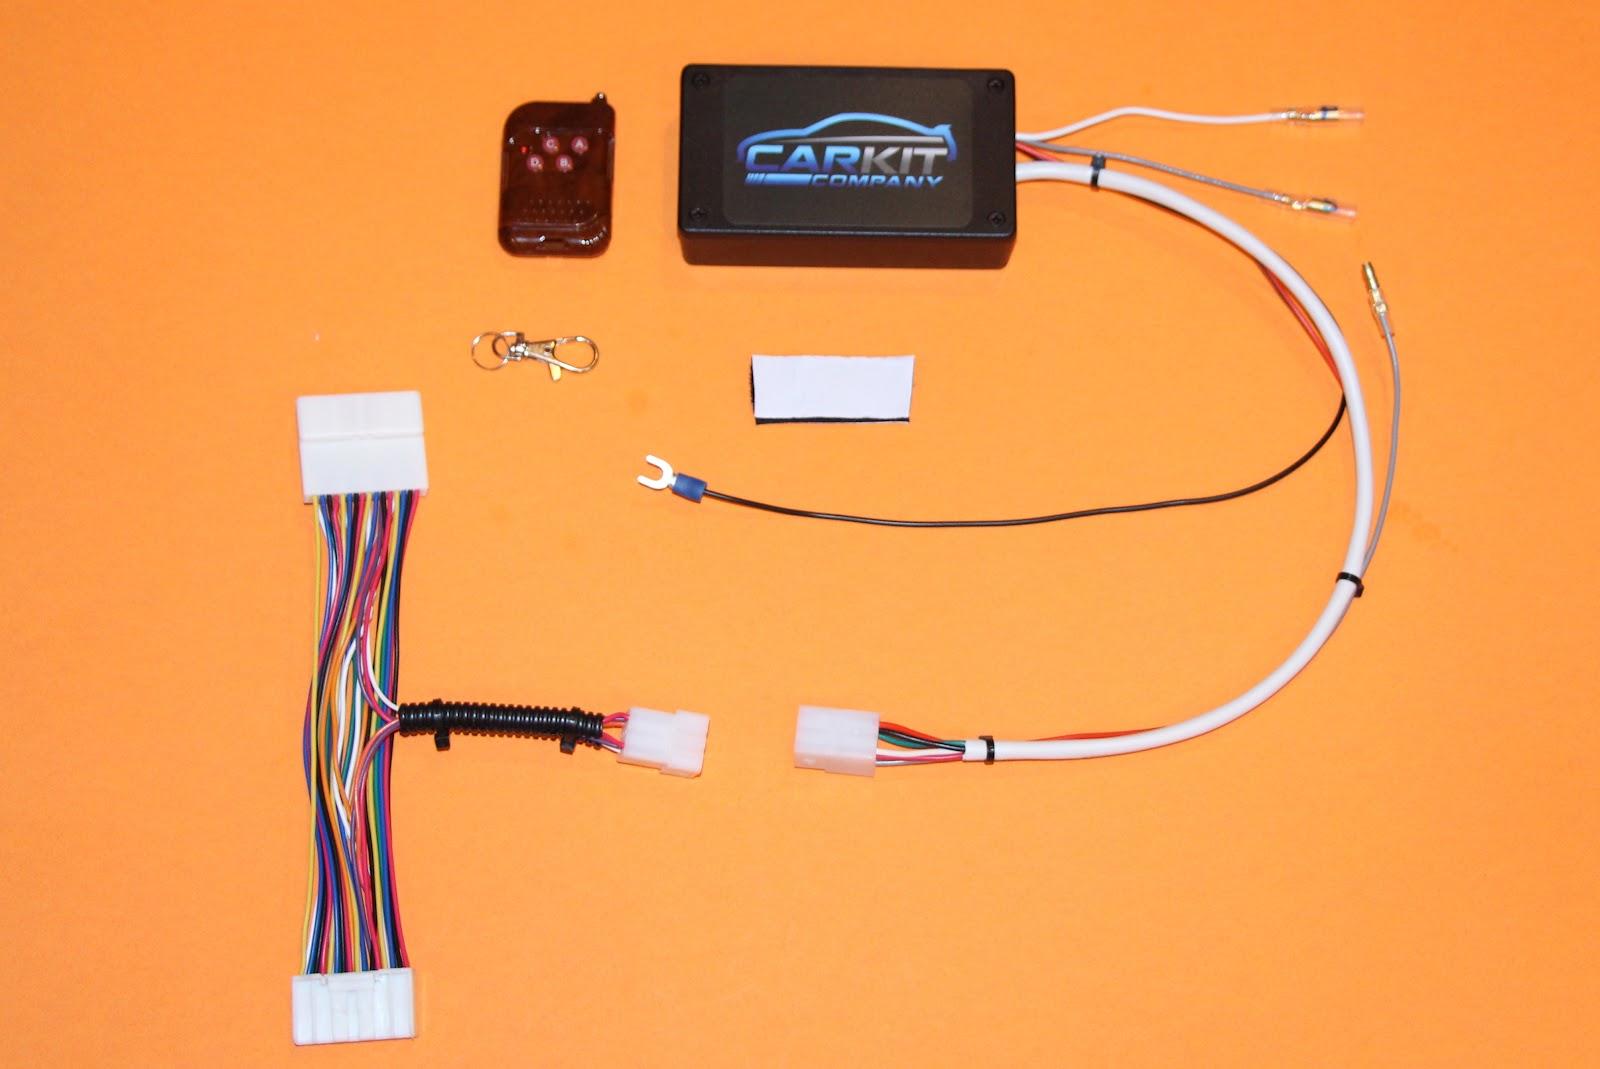 Pathfinder non nav car kit company latest remote kit sciox Choice Image